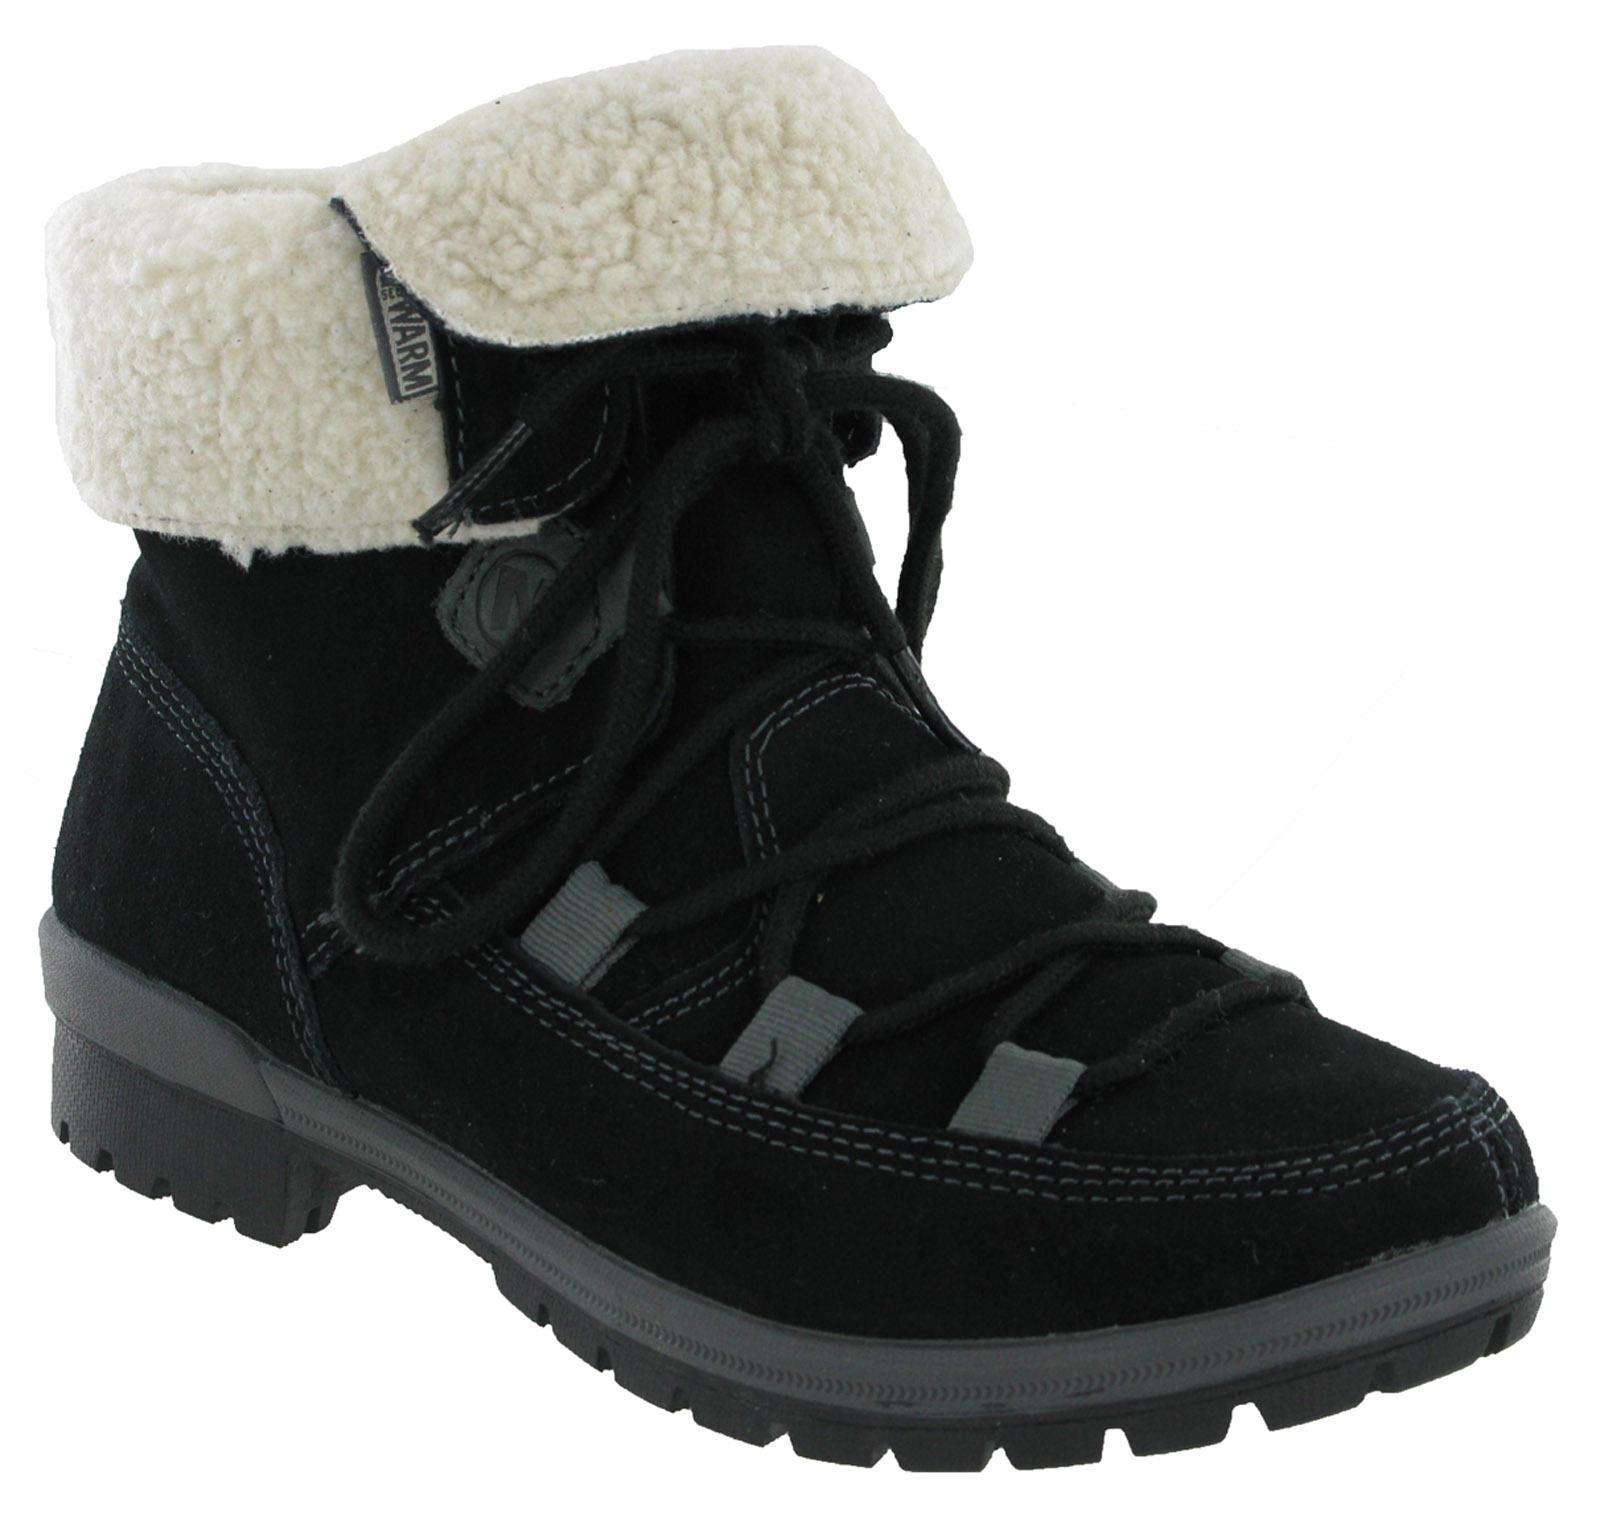 Merrell Esmeril Encaje Cálida Lana Lana Lana Forrada Para Mujer botas al Tobillo Caminar Negro UK3.5-8.5  servicio considerado